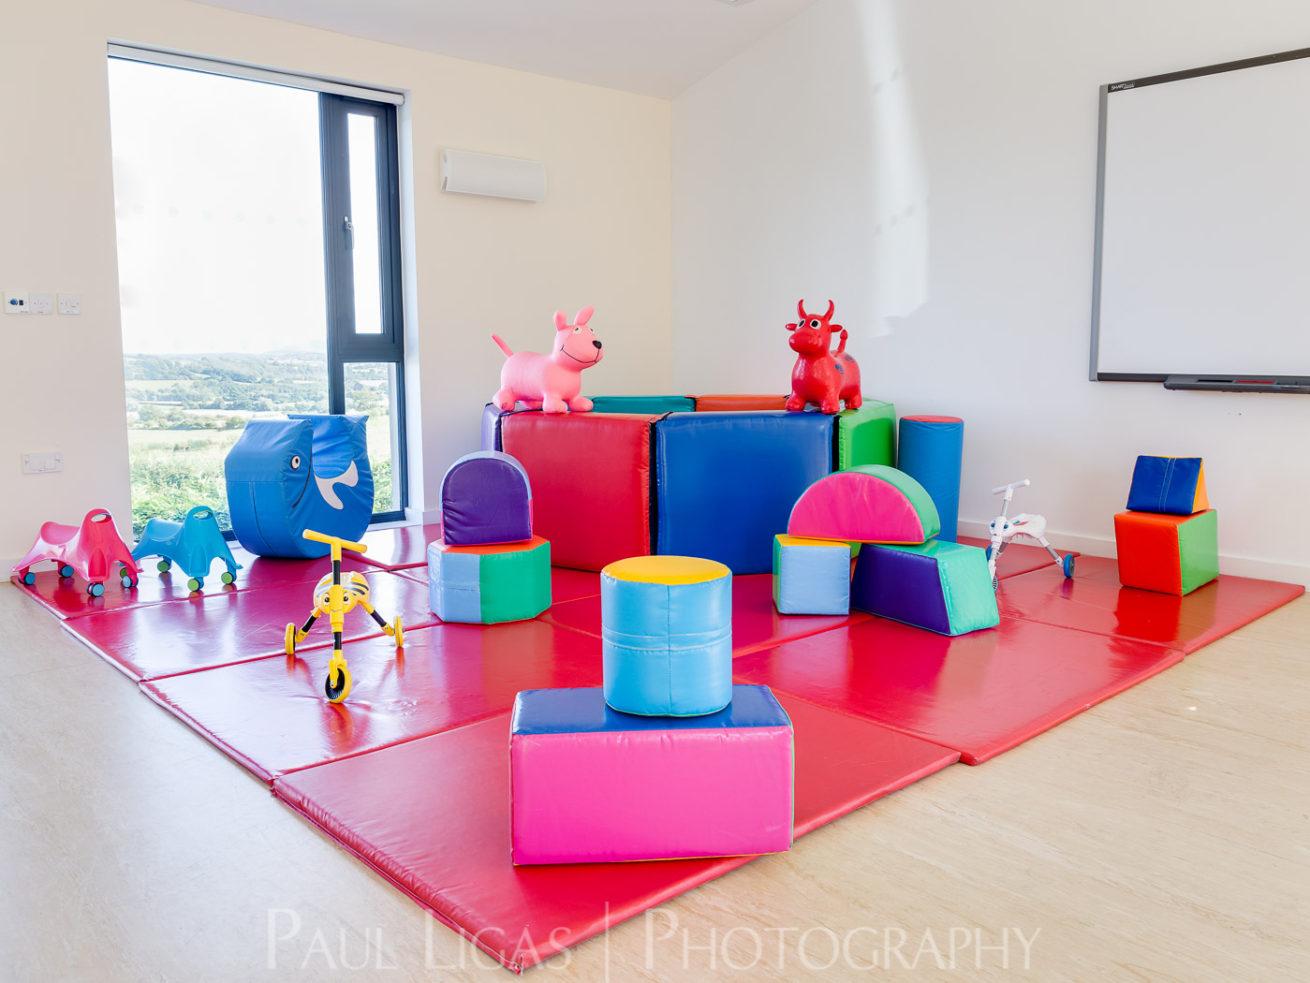 HOPE Family Centre, Bromyard, Herefordshire business lifestyle photographer photography 1268